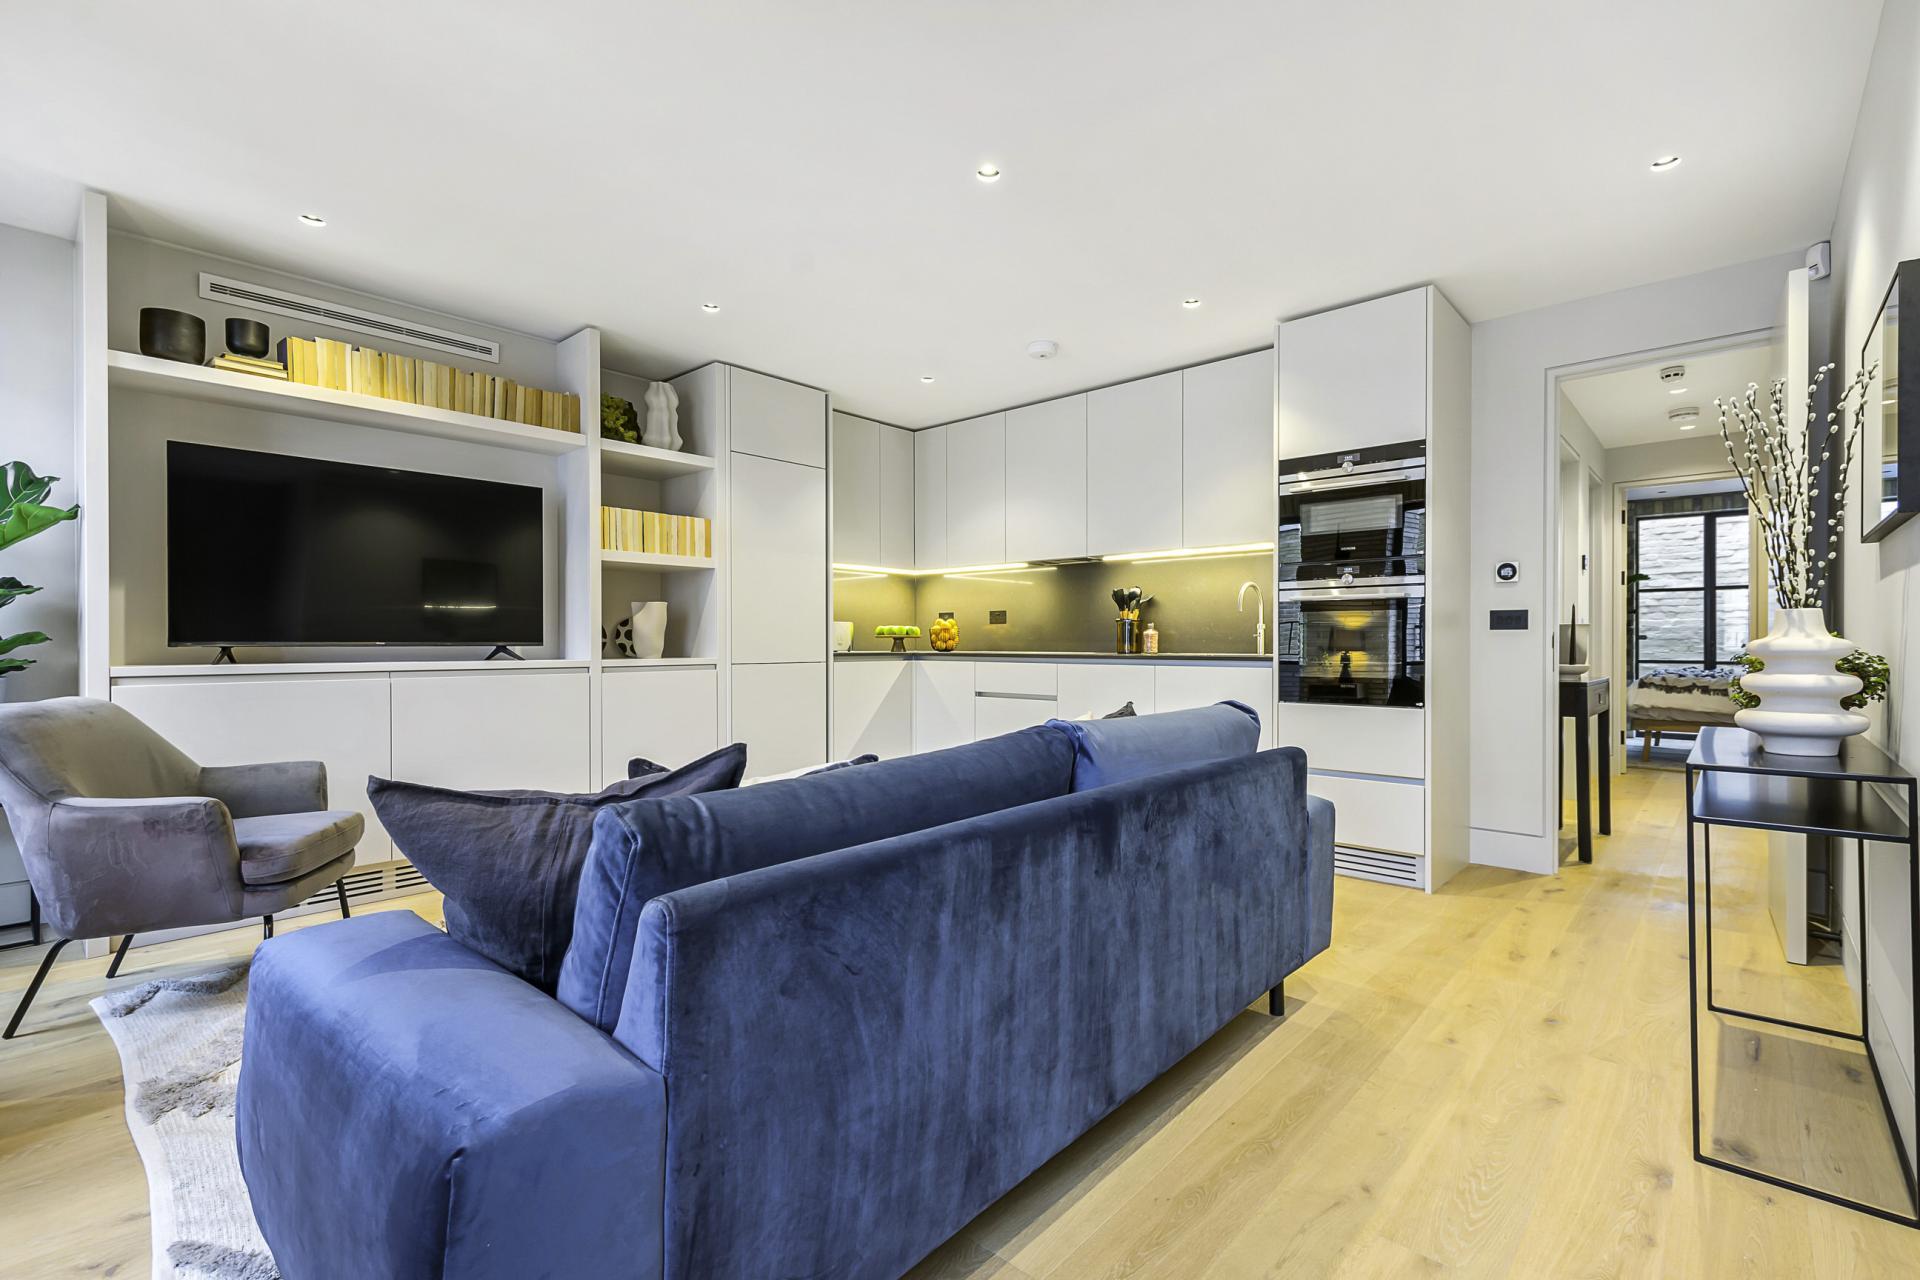 Blue sofa at King's Mews Apartments, Holborn, London - Citybase Apartments